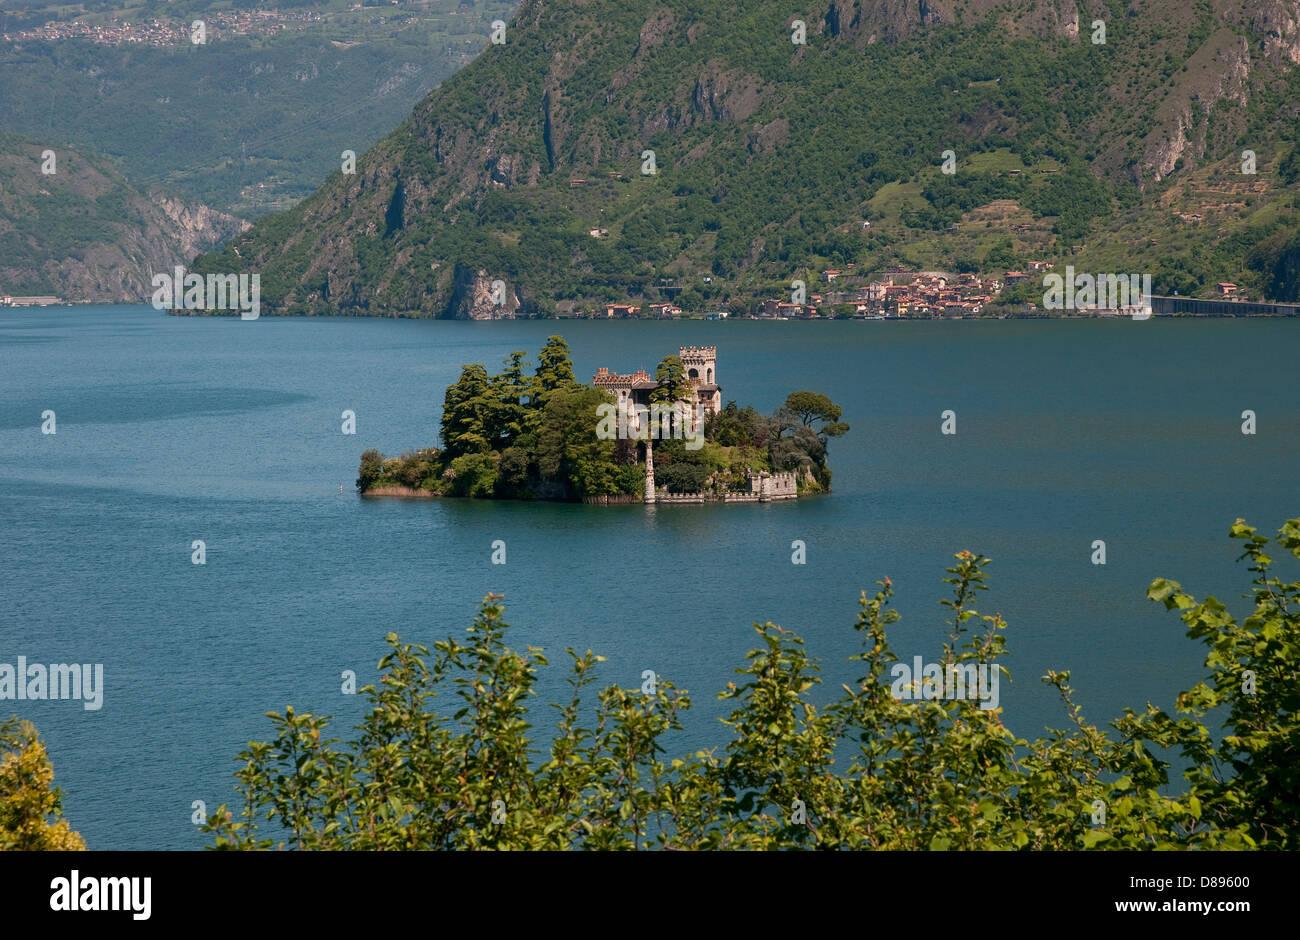 isola di loreto, monte isola, lake iseo, lombardy, italy - Stock Image